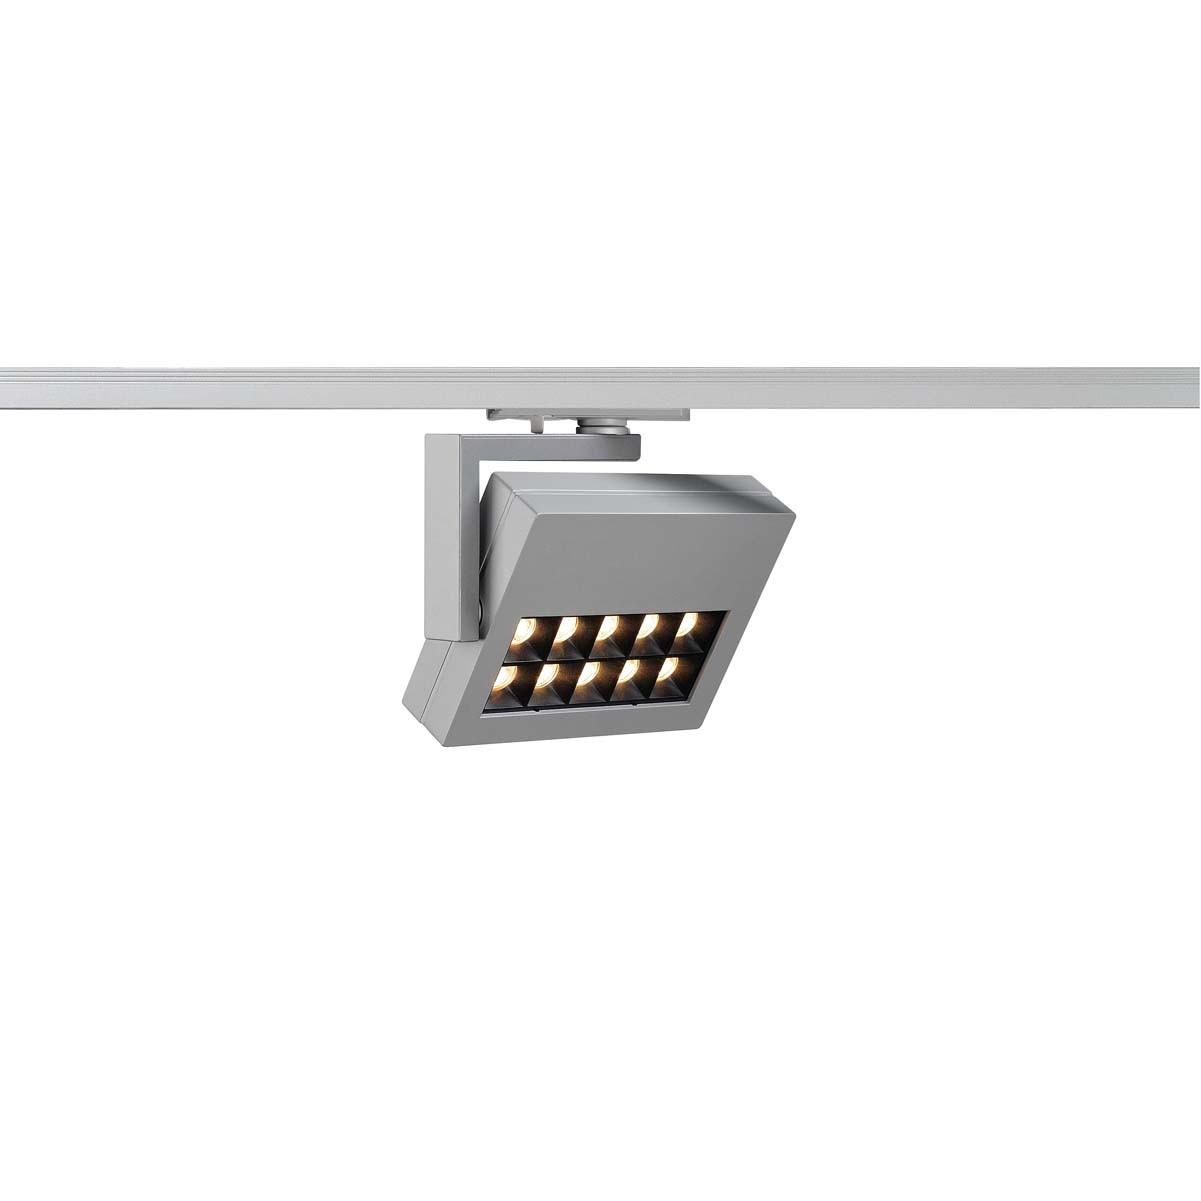 SLV 144054 Profuno LED Spot 18W 3000K 1 Circuit 240v Track Light Silver Grey